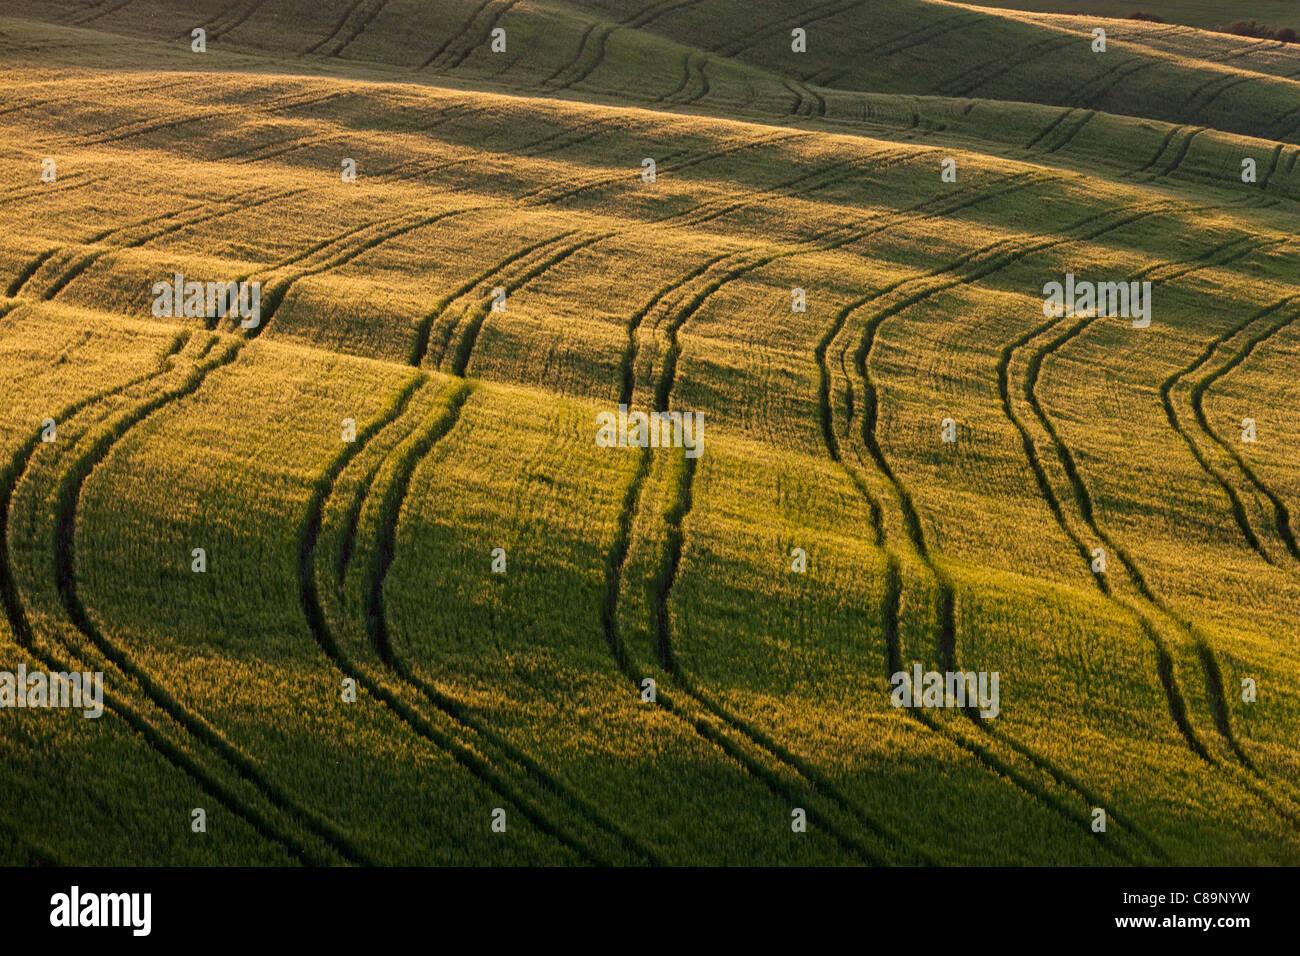 Italy, Tuscany, Crete, View of tire tracks in cornfield - Stock Image